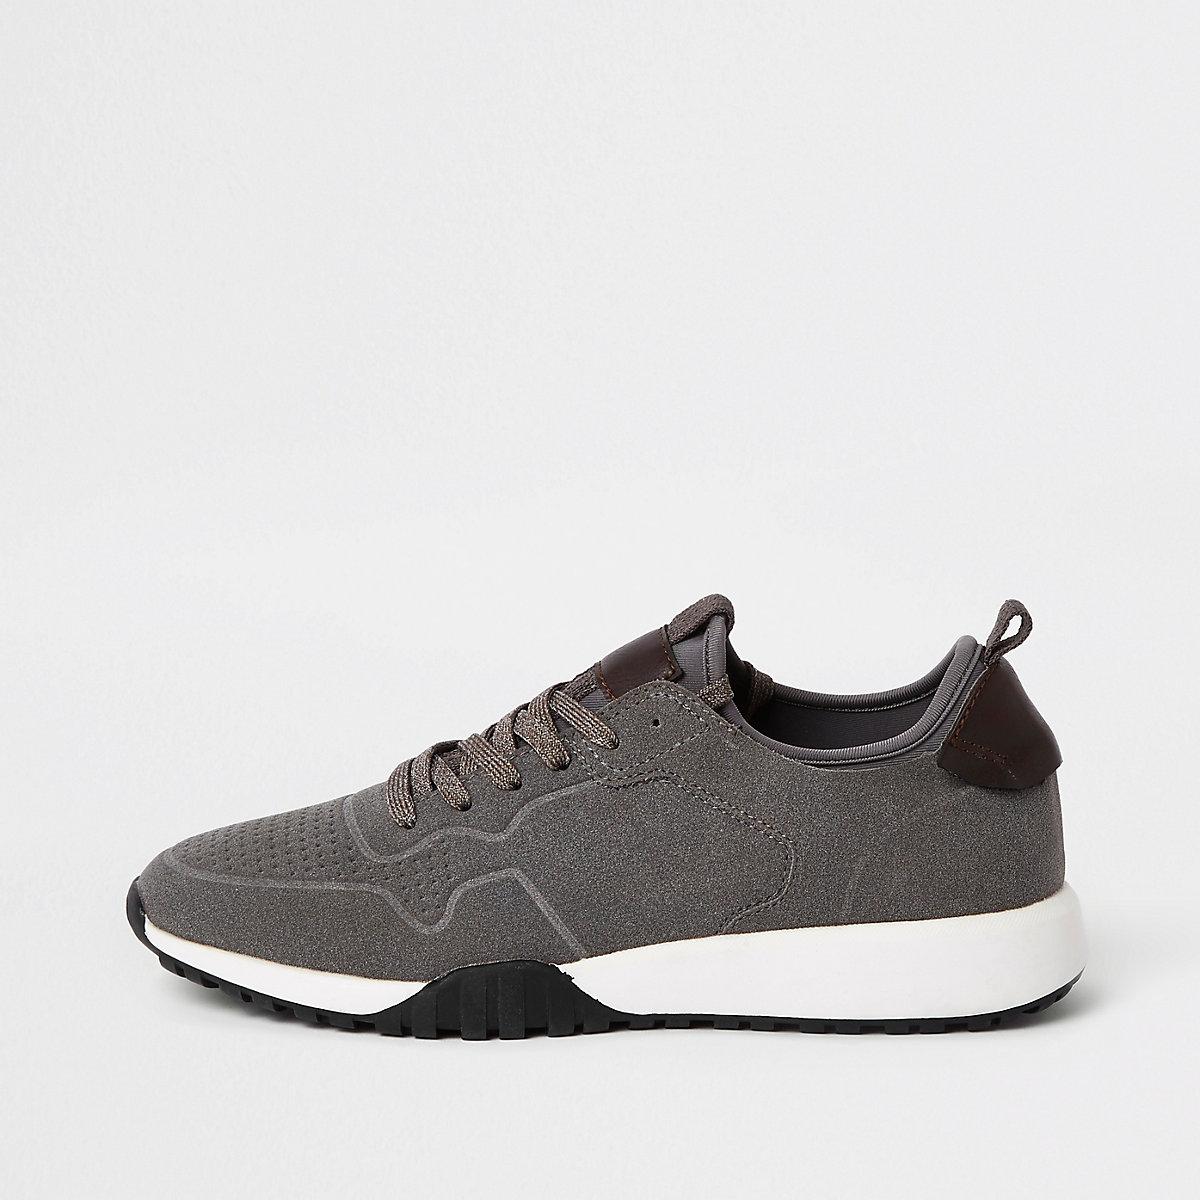 Grey suede runner trainers